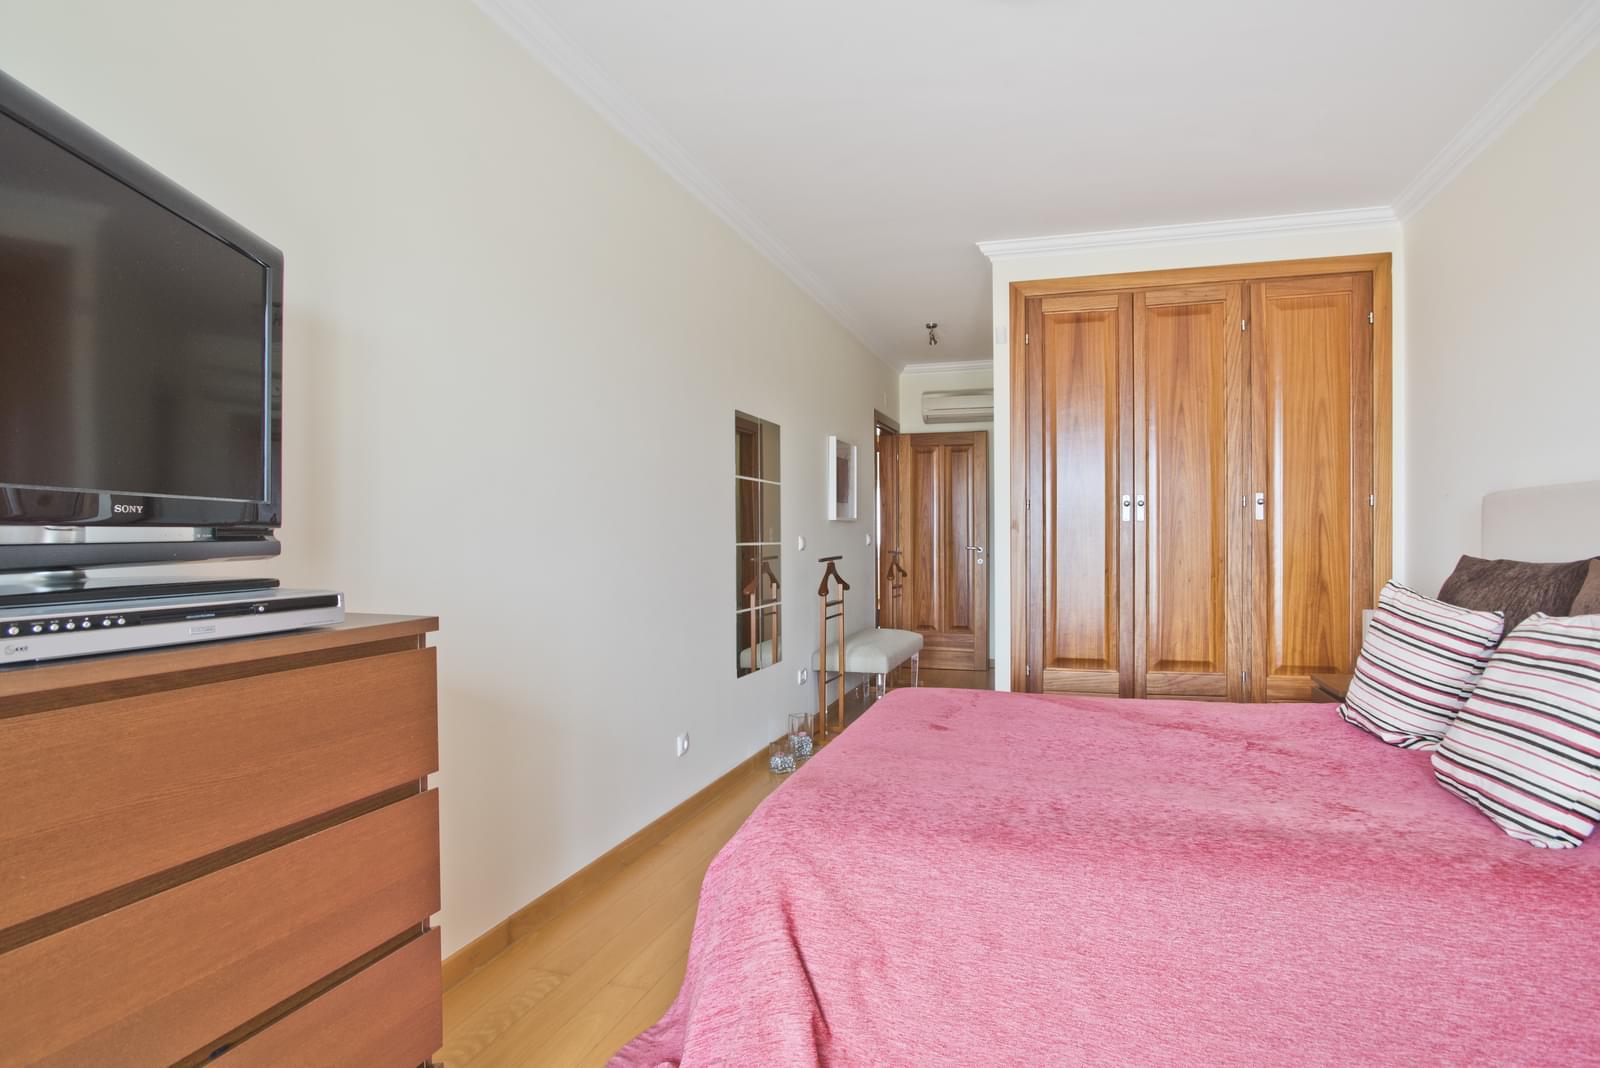 pf17004-apartamento-t3-cascais-45d4d6b2-4979-4cfb-8496-ed47d50e9854